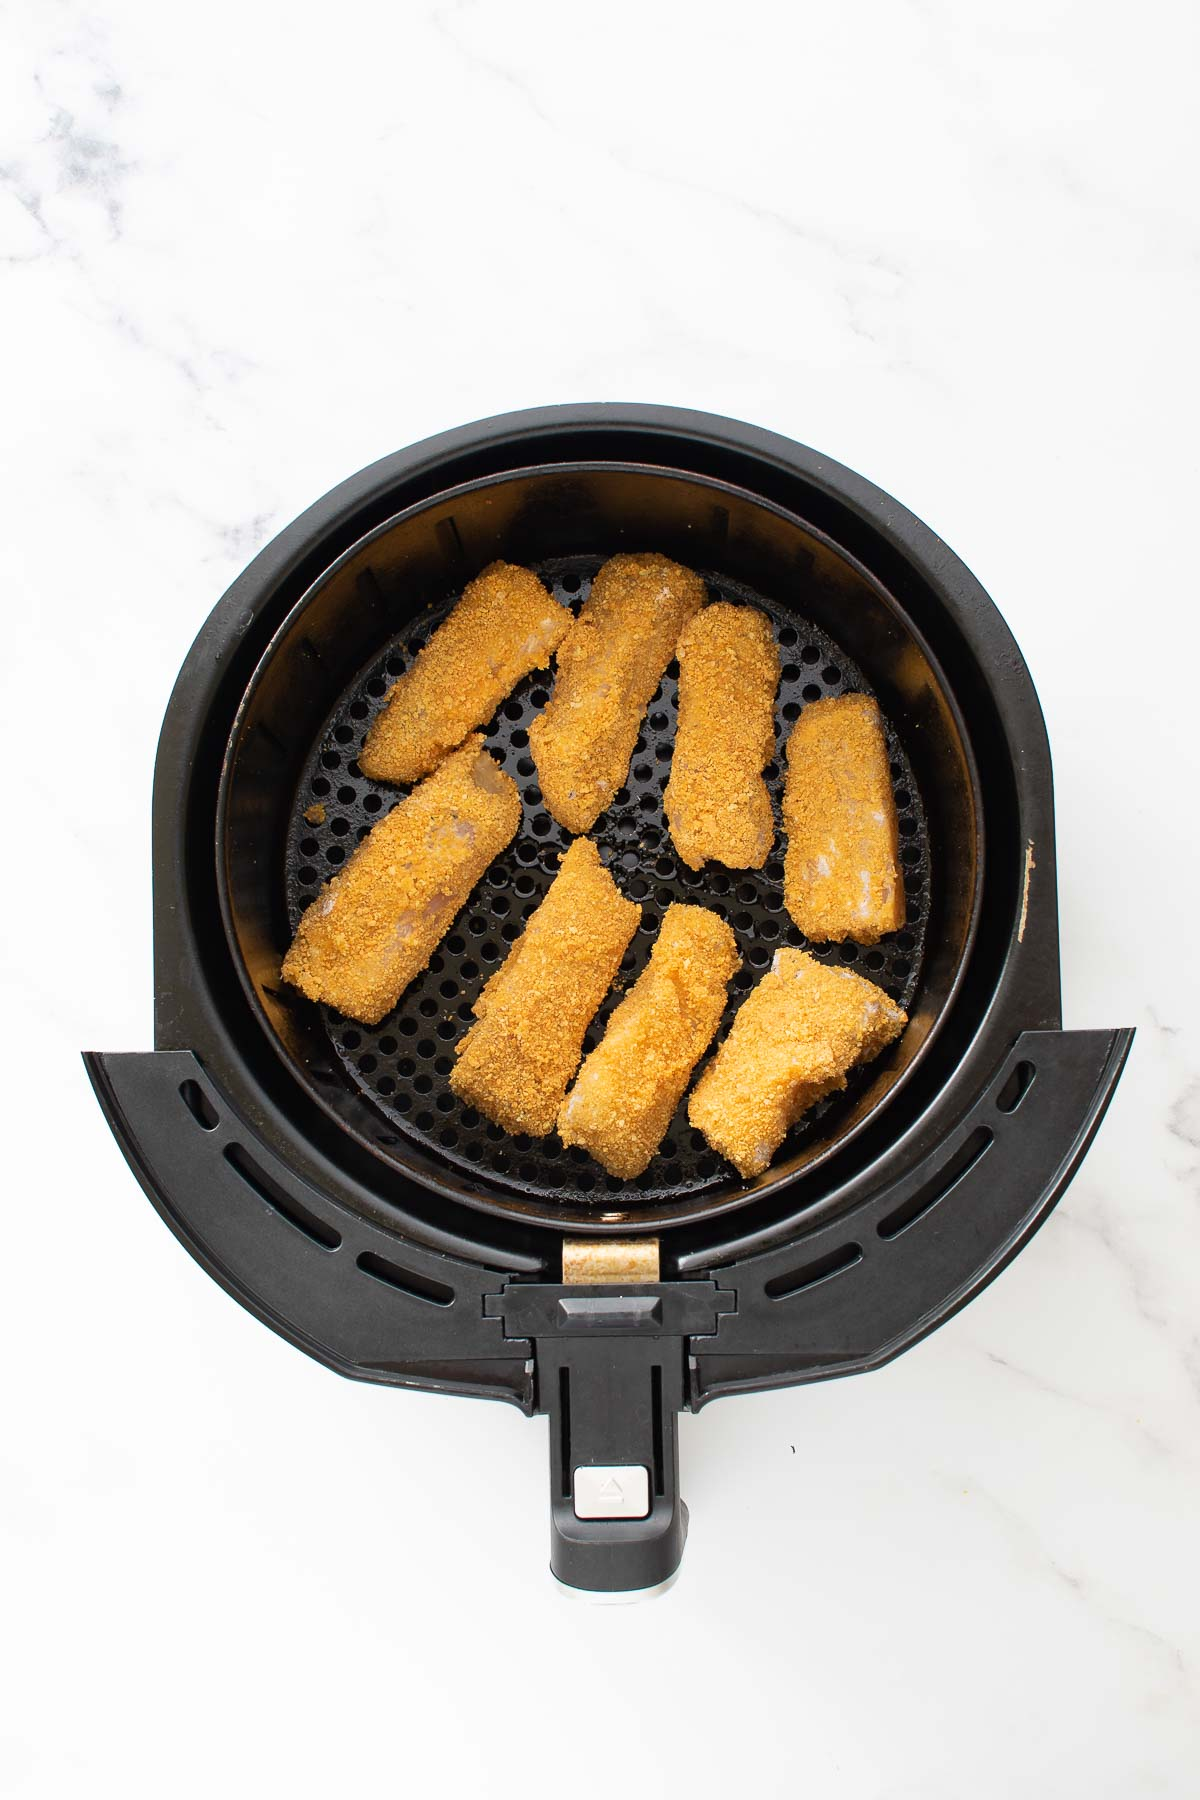 Fish sticks in an air fryer.